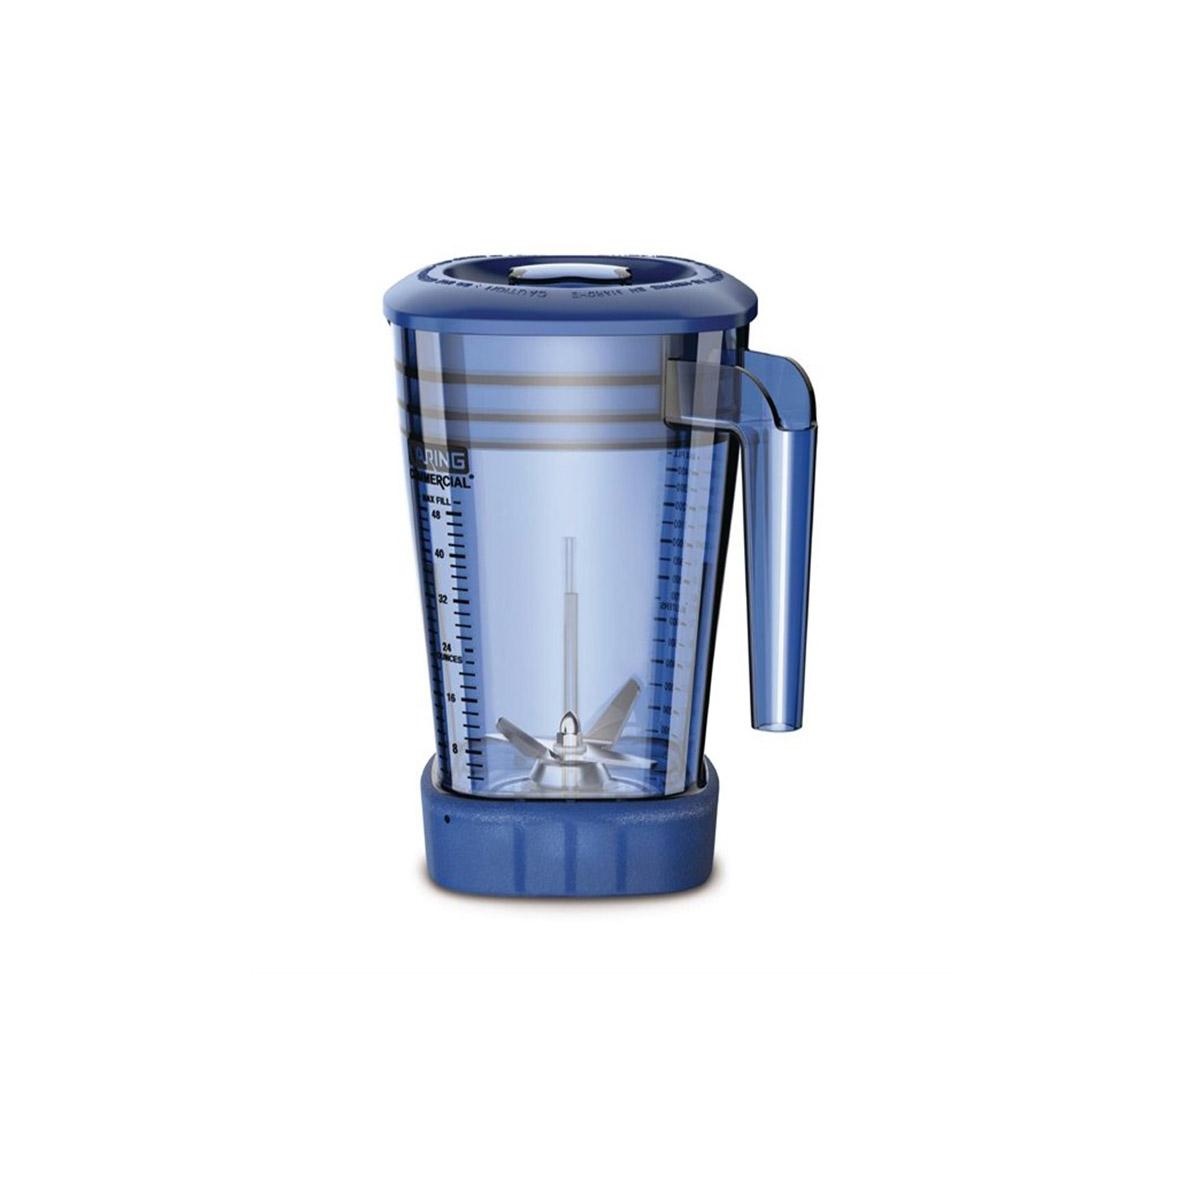 Waring Blue 1.4Ltr Jar for use with Waring Xtreme Hi-Power Blender